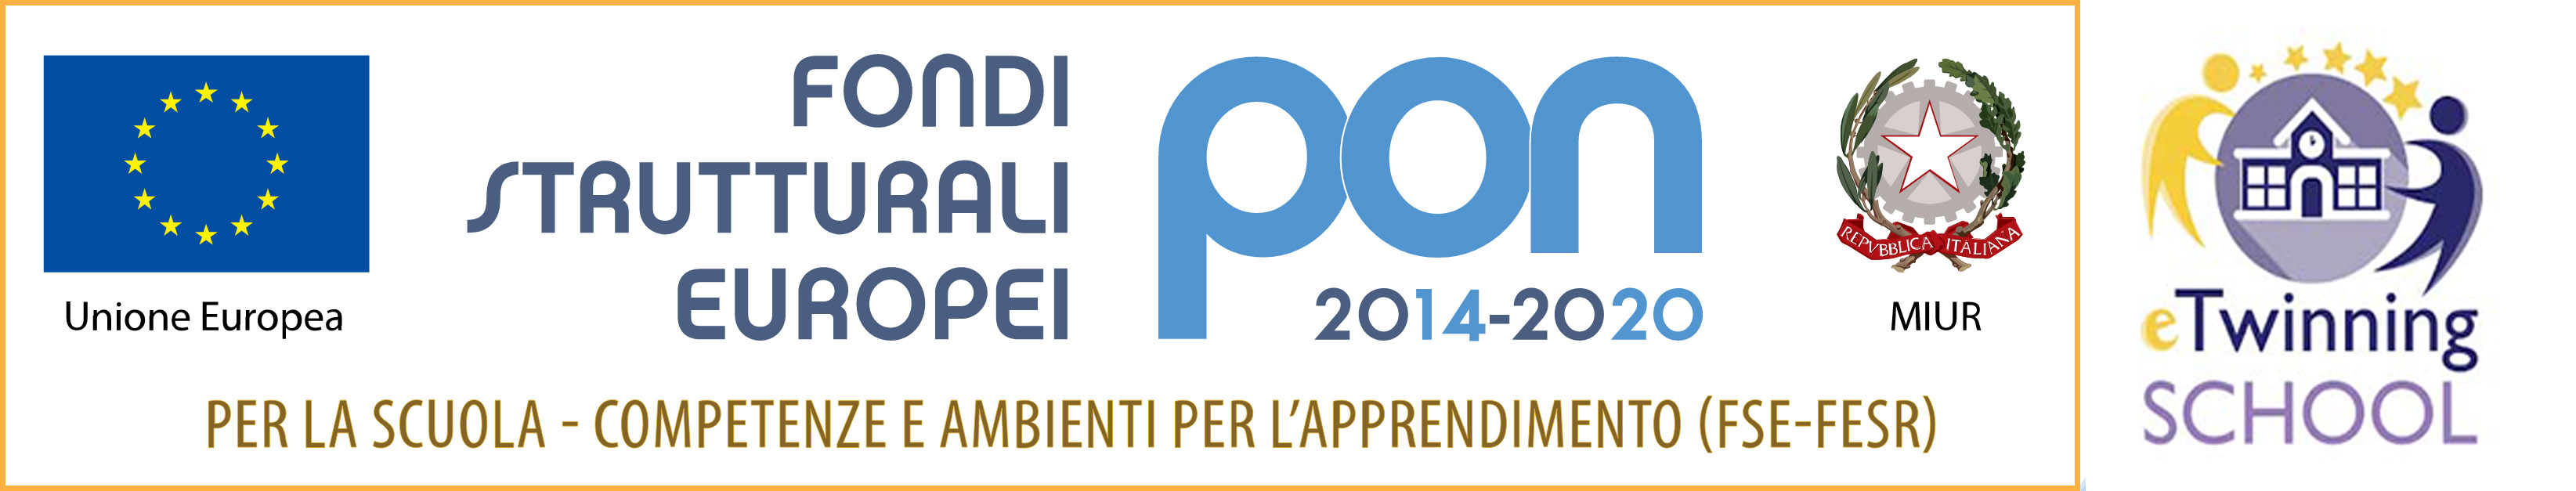 PON-2014-2020 e eTwinning